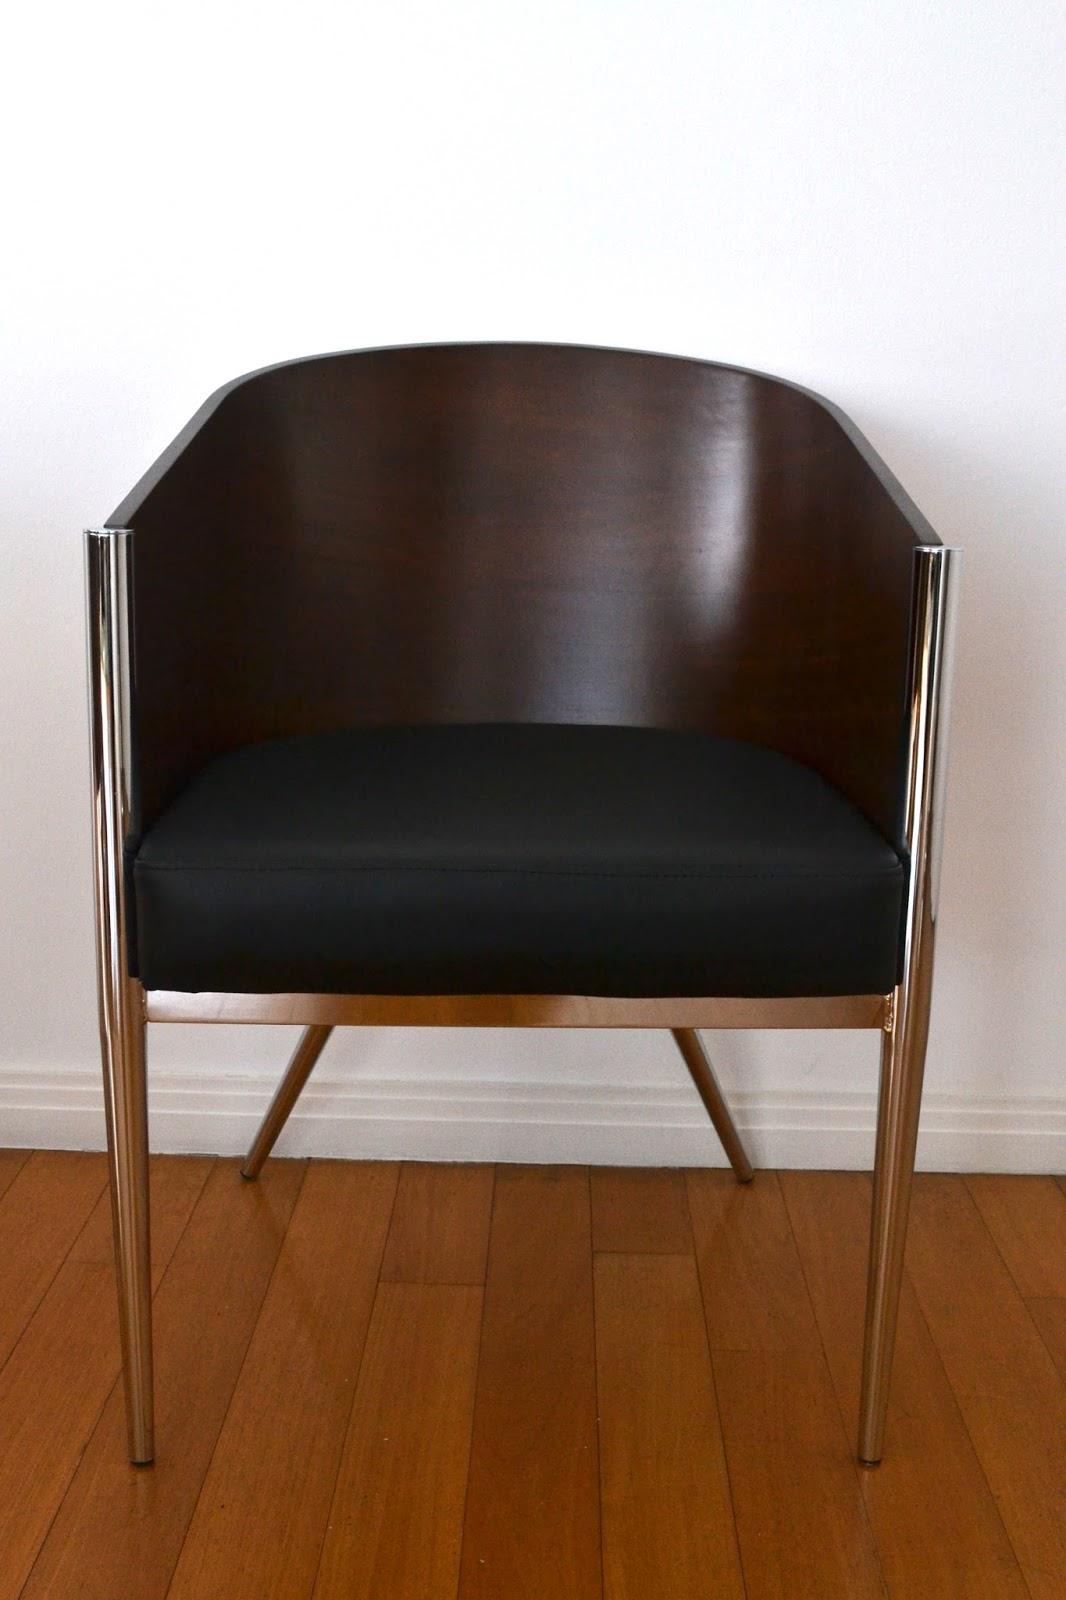 alma deco buenos aires sillon starck. Black Bedroom Furniture Sets. Home Design Ideas